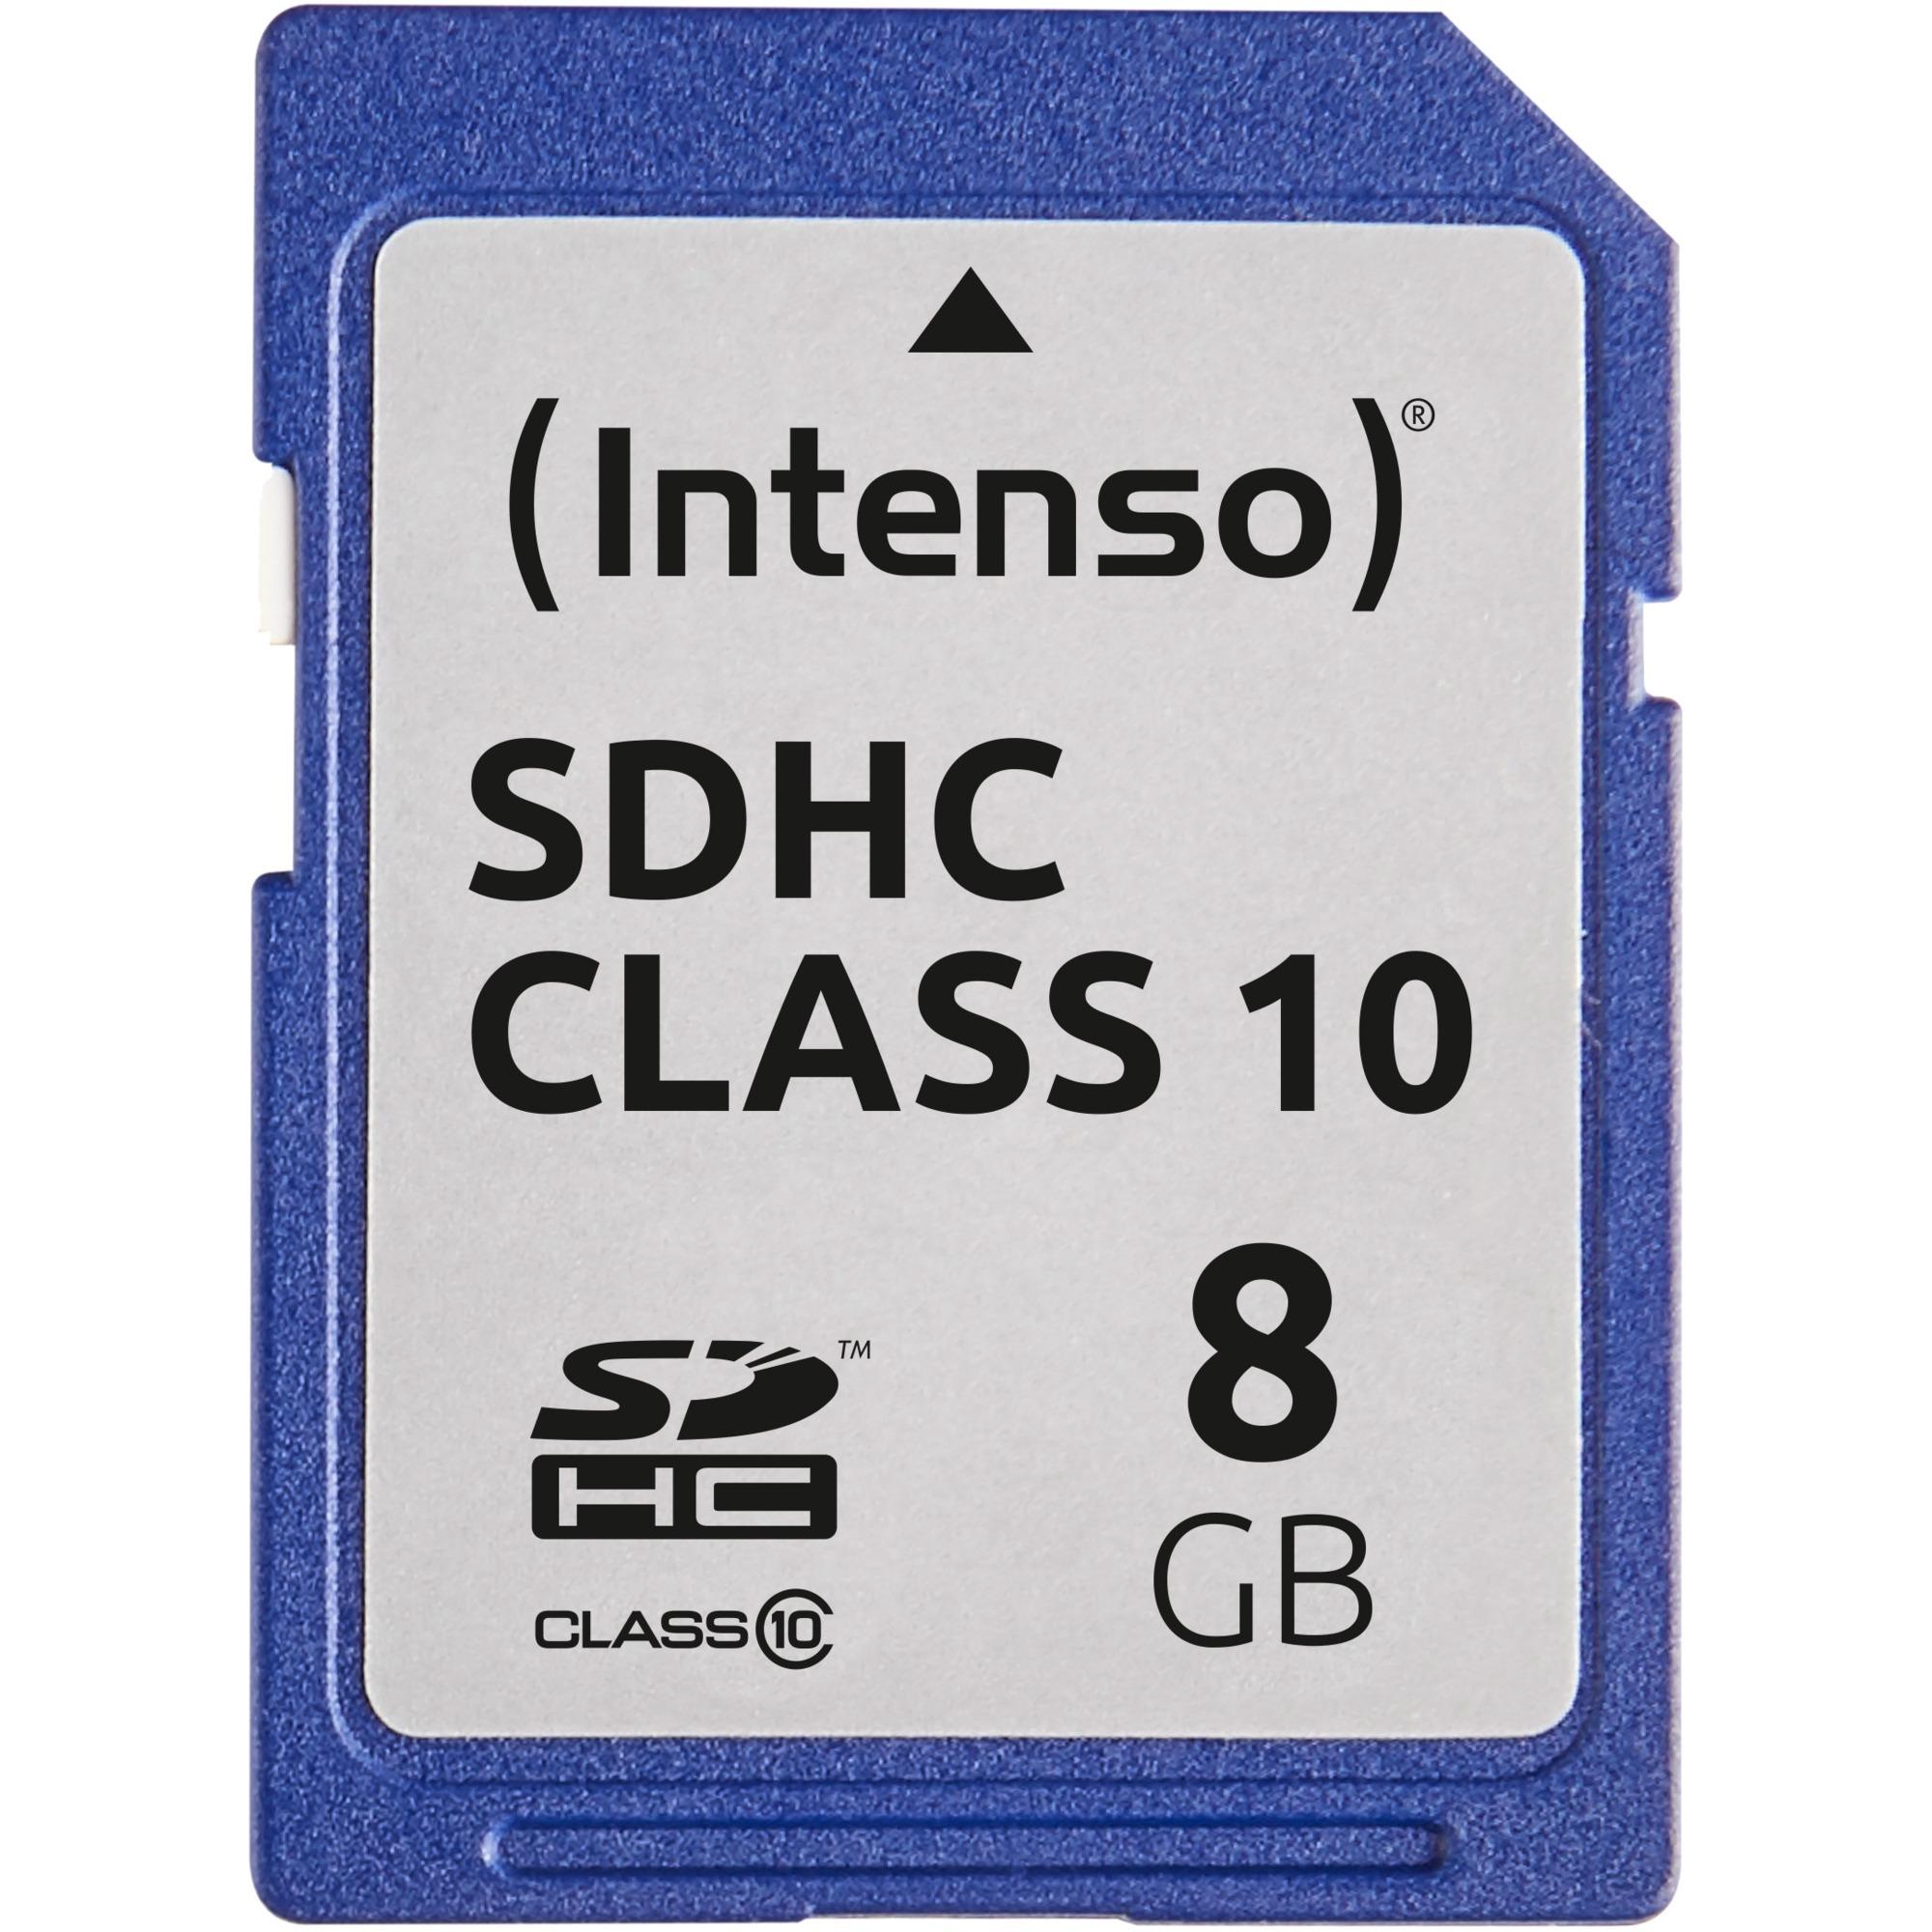 8gb-sdhc-8gb-sdhc-klasse-10-flash-hukommelse-hukommelseskort